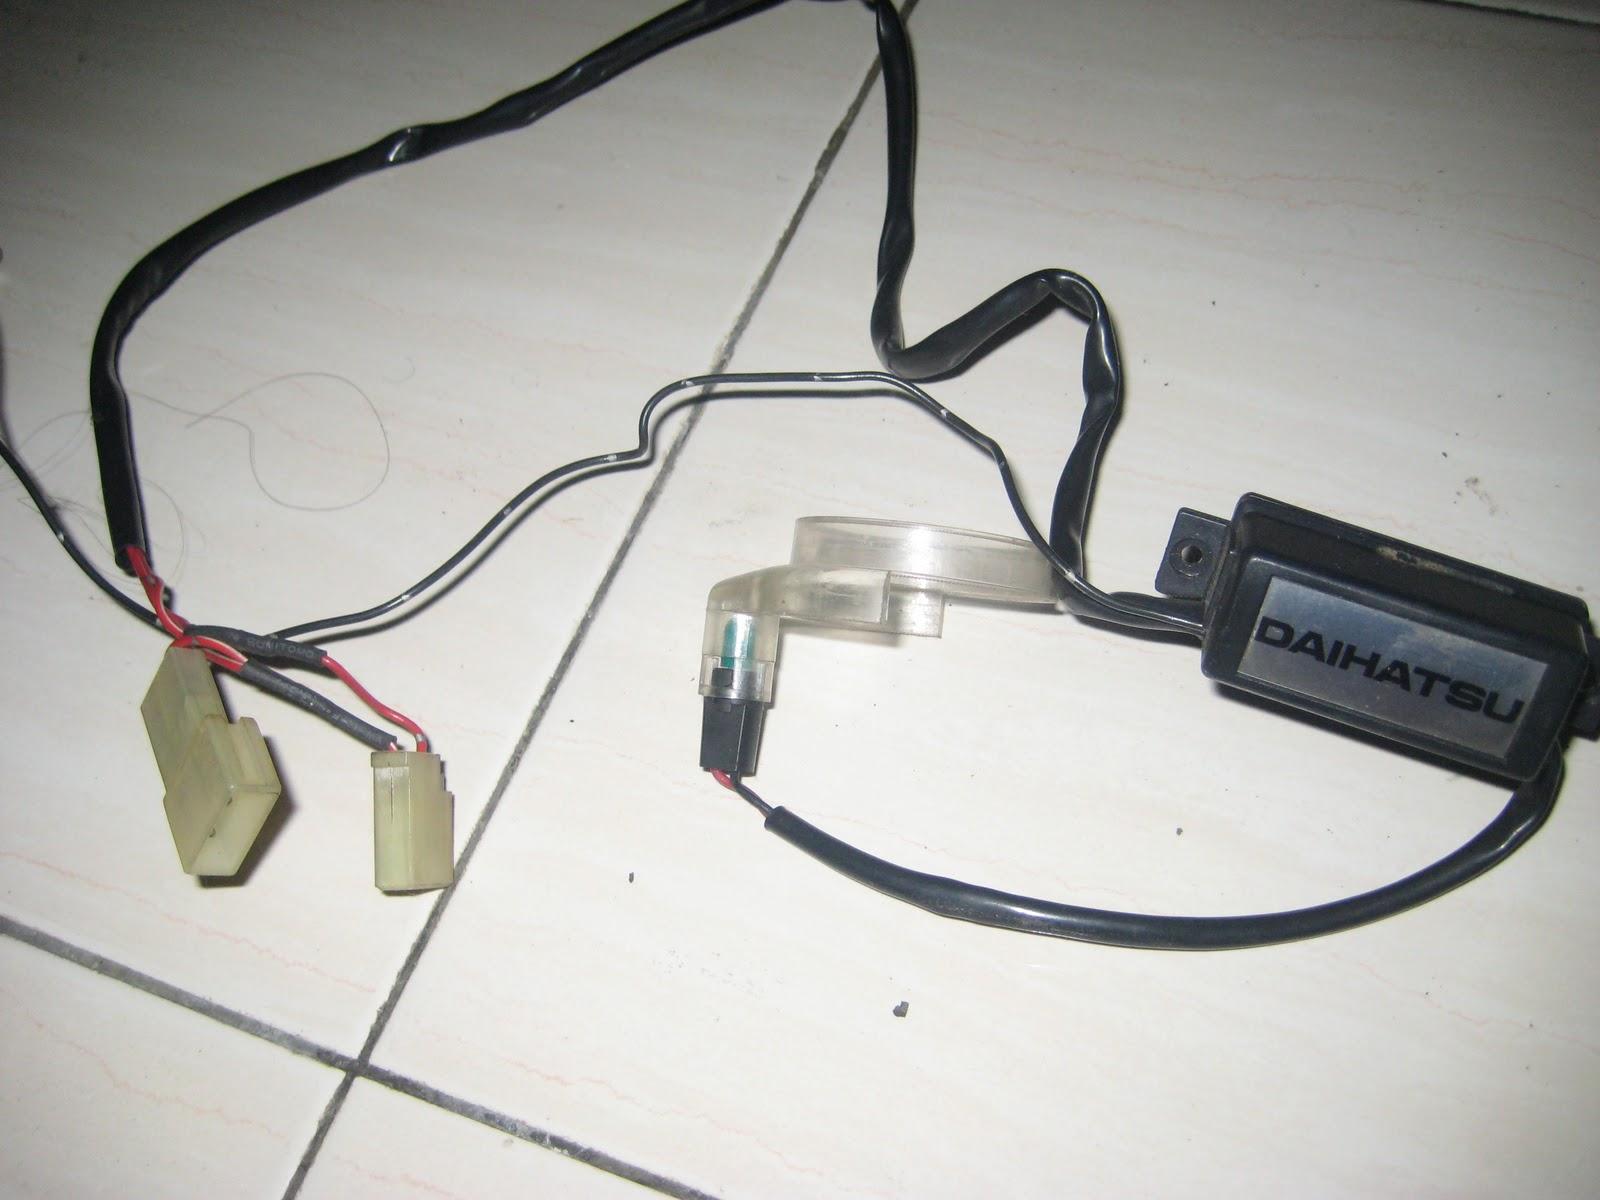 Item: Daihatsu MIRA l500/l200 Key lamp. Description: Good  Condition..Original part daihatsu..tested. Price:RMSOLD Payment Type:  COD/MAYBANK2u/ATM DEPOSIT ...